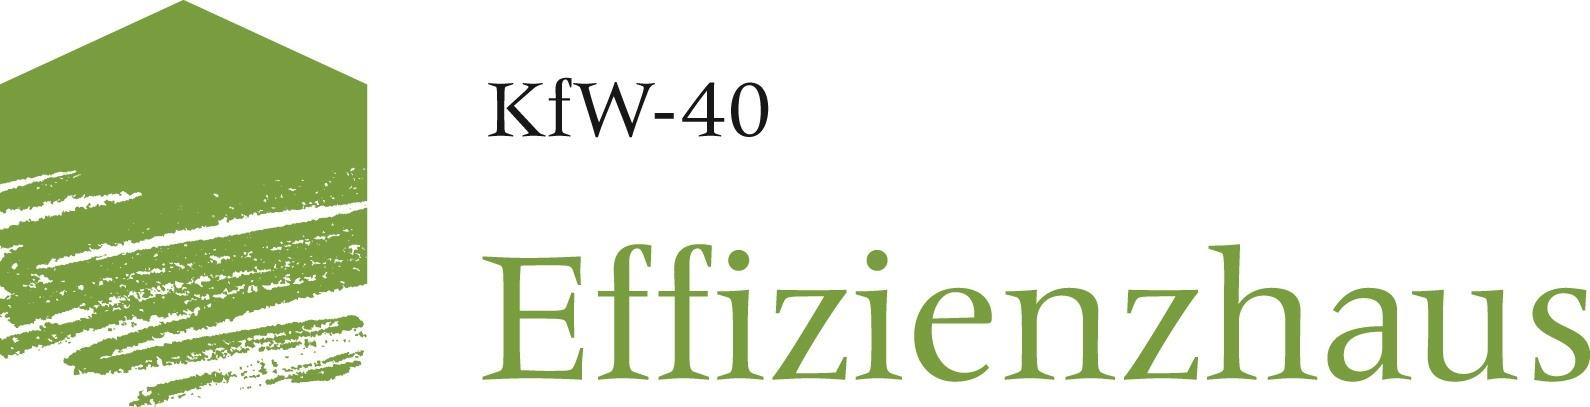 Effizienzhaus kfw40 rgb